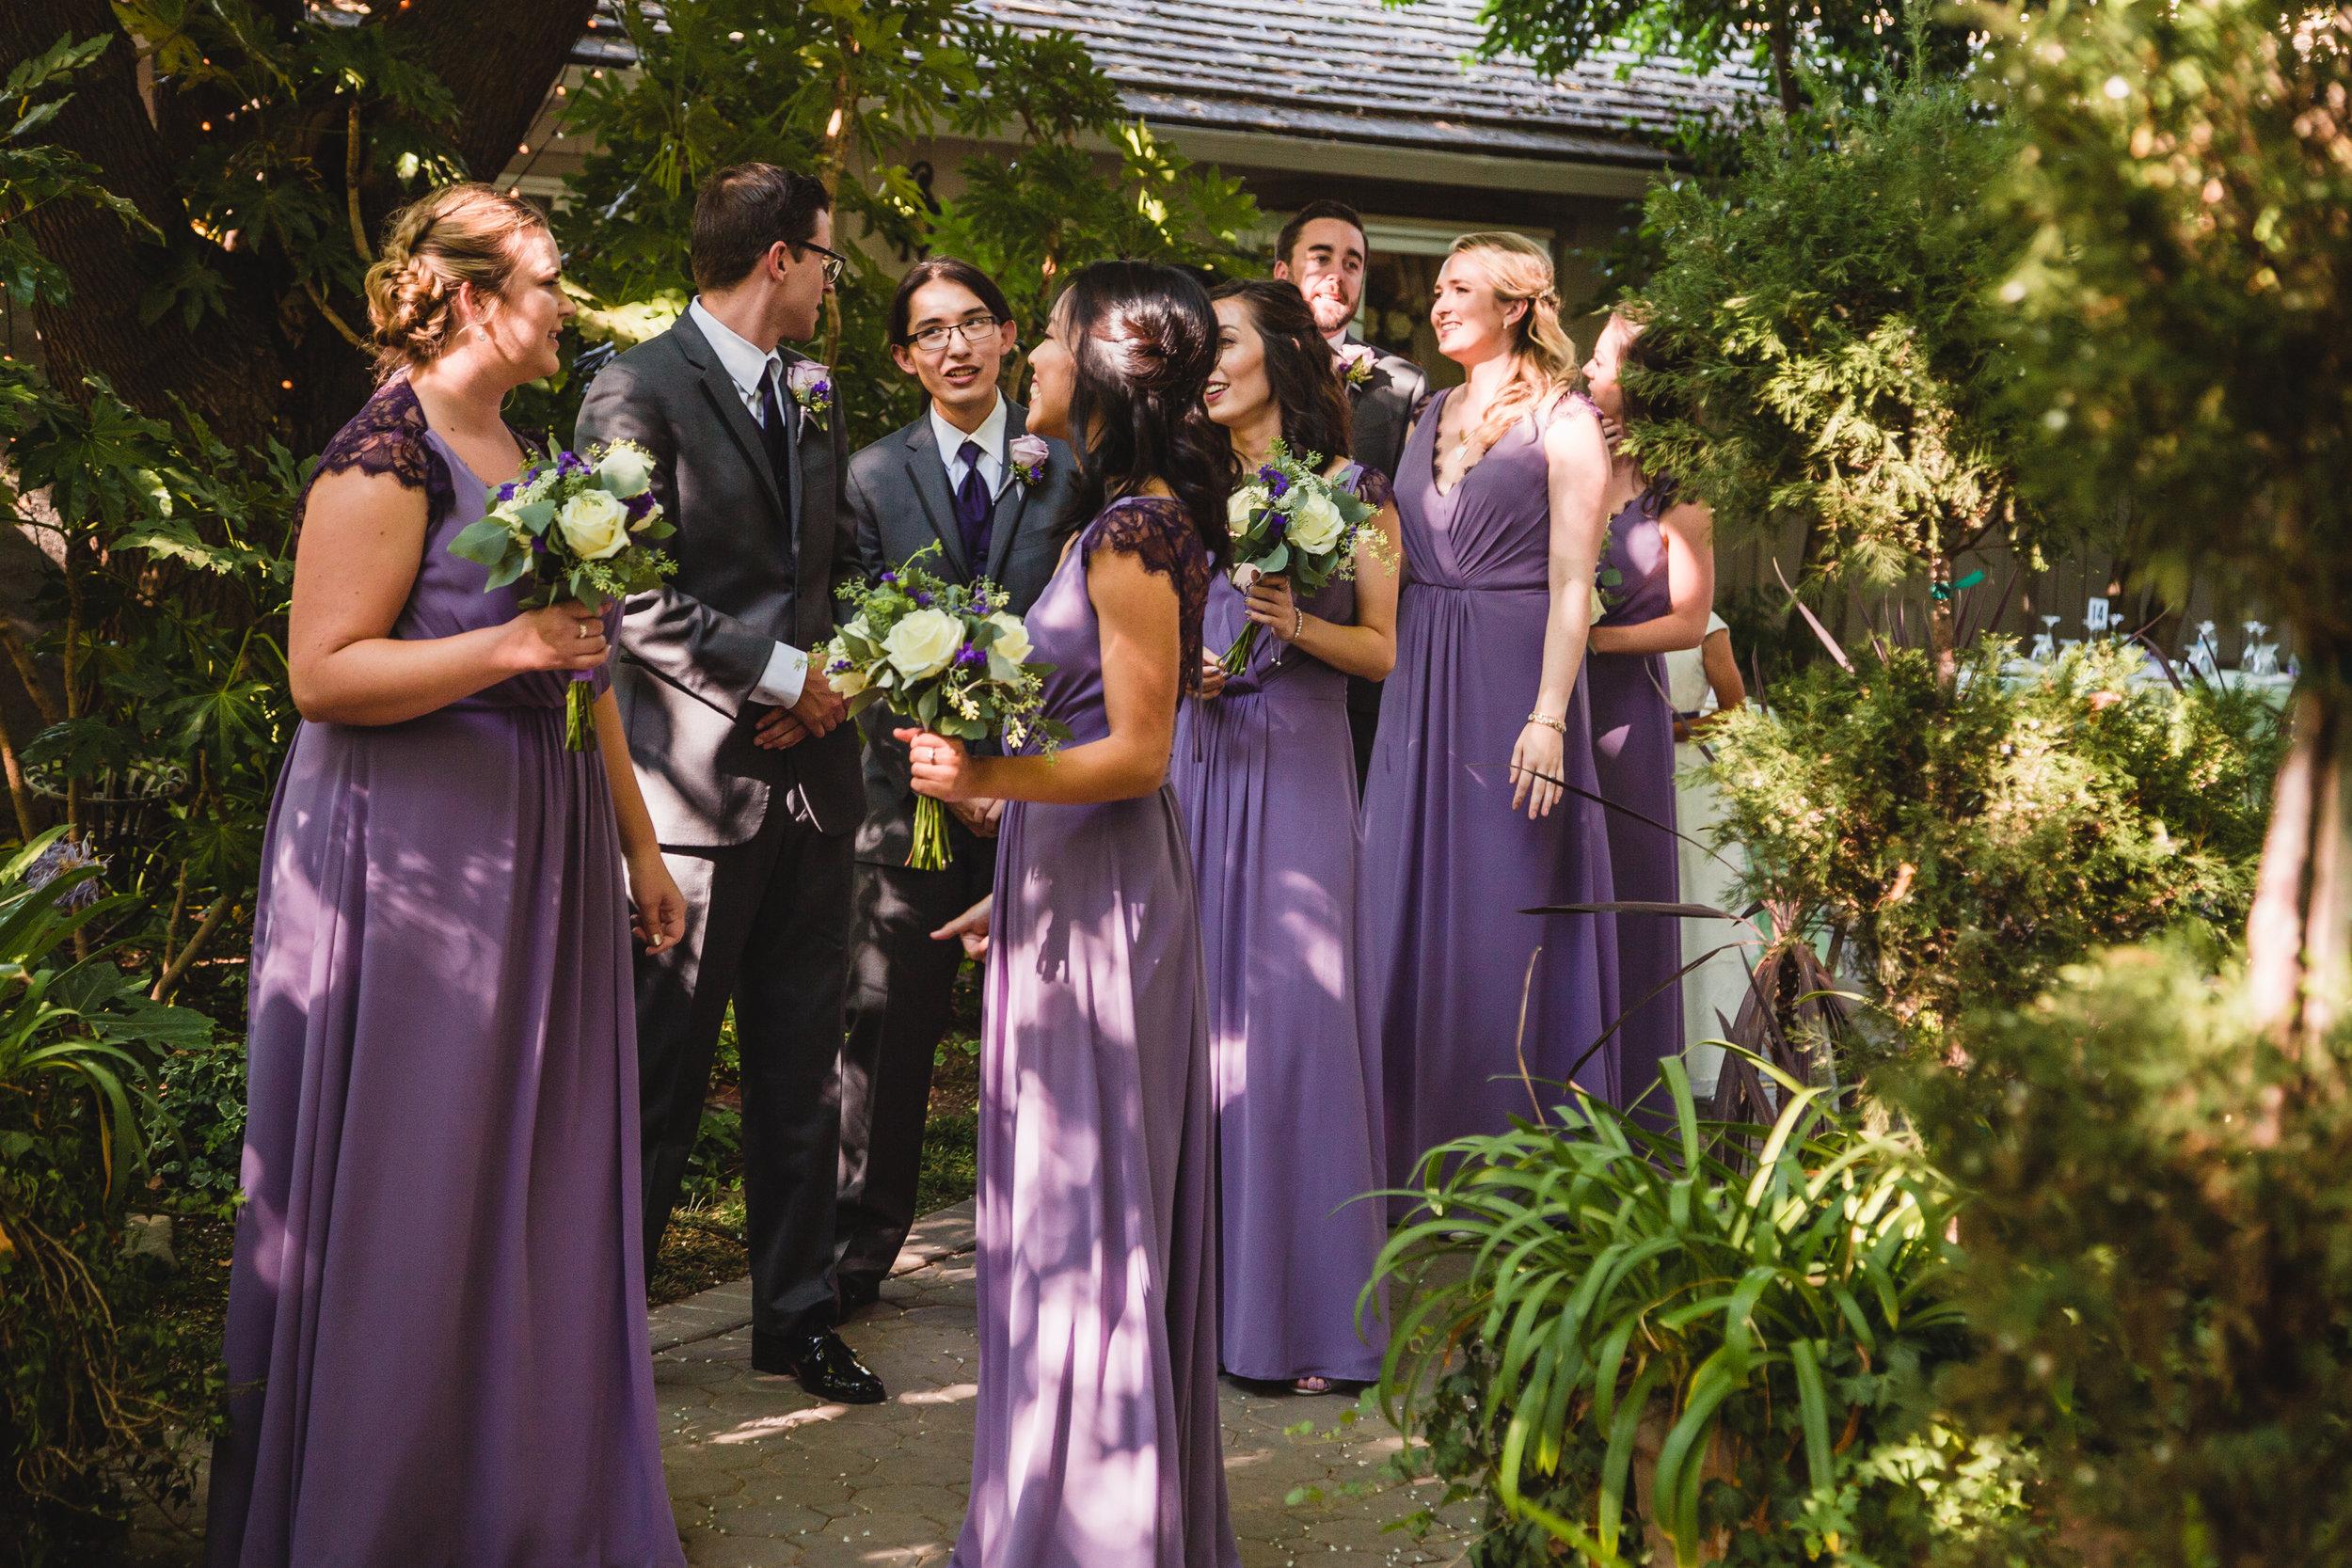 rebeccaylasotras-bay-area-garden-wedding-19.jpg